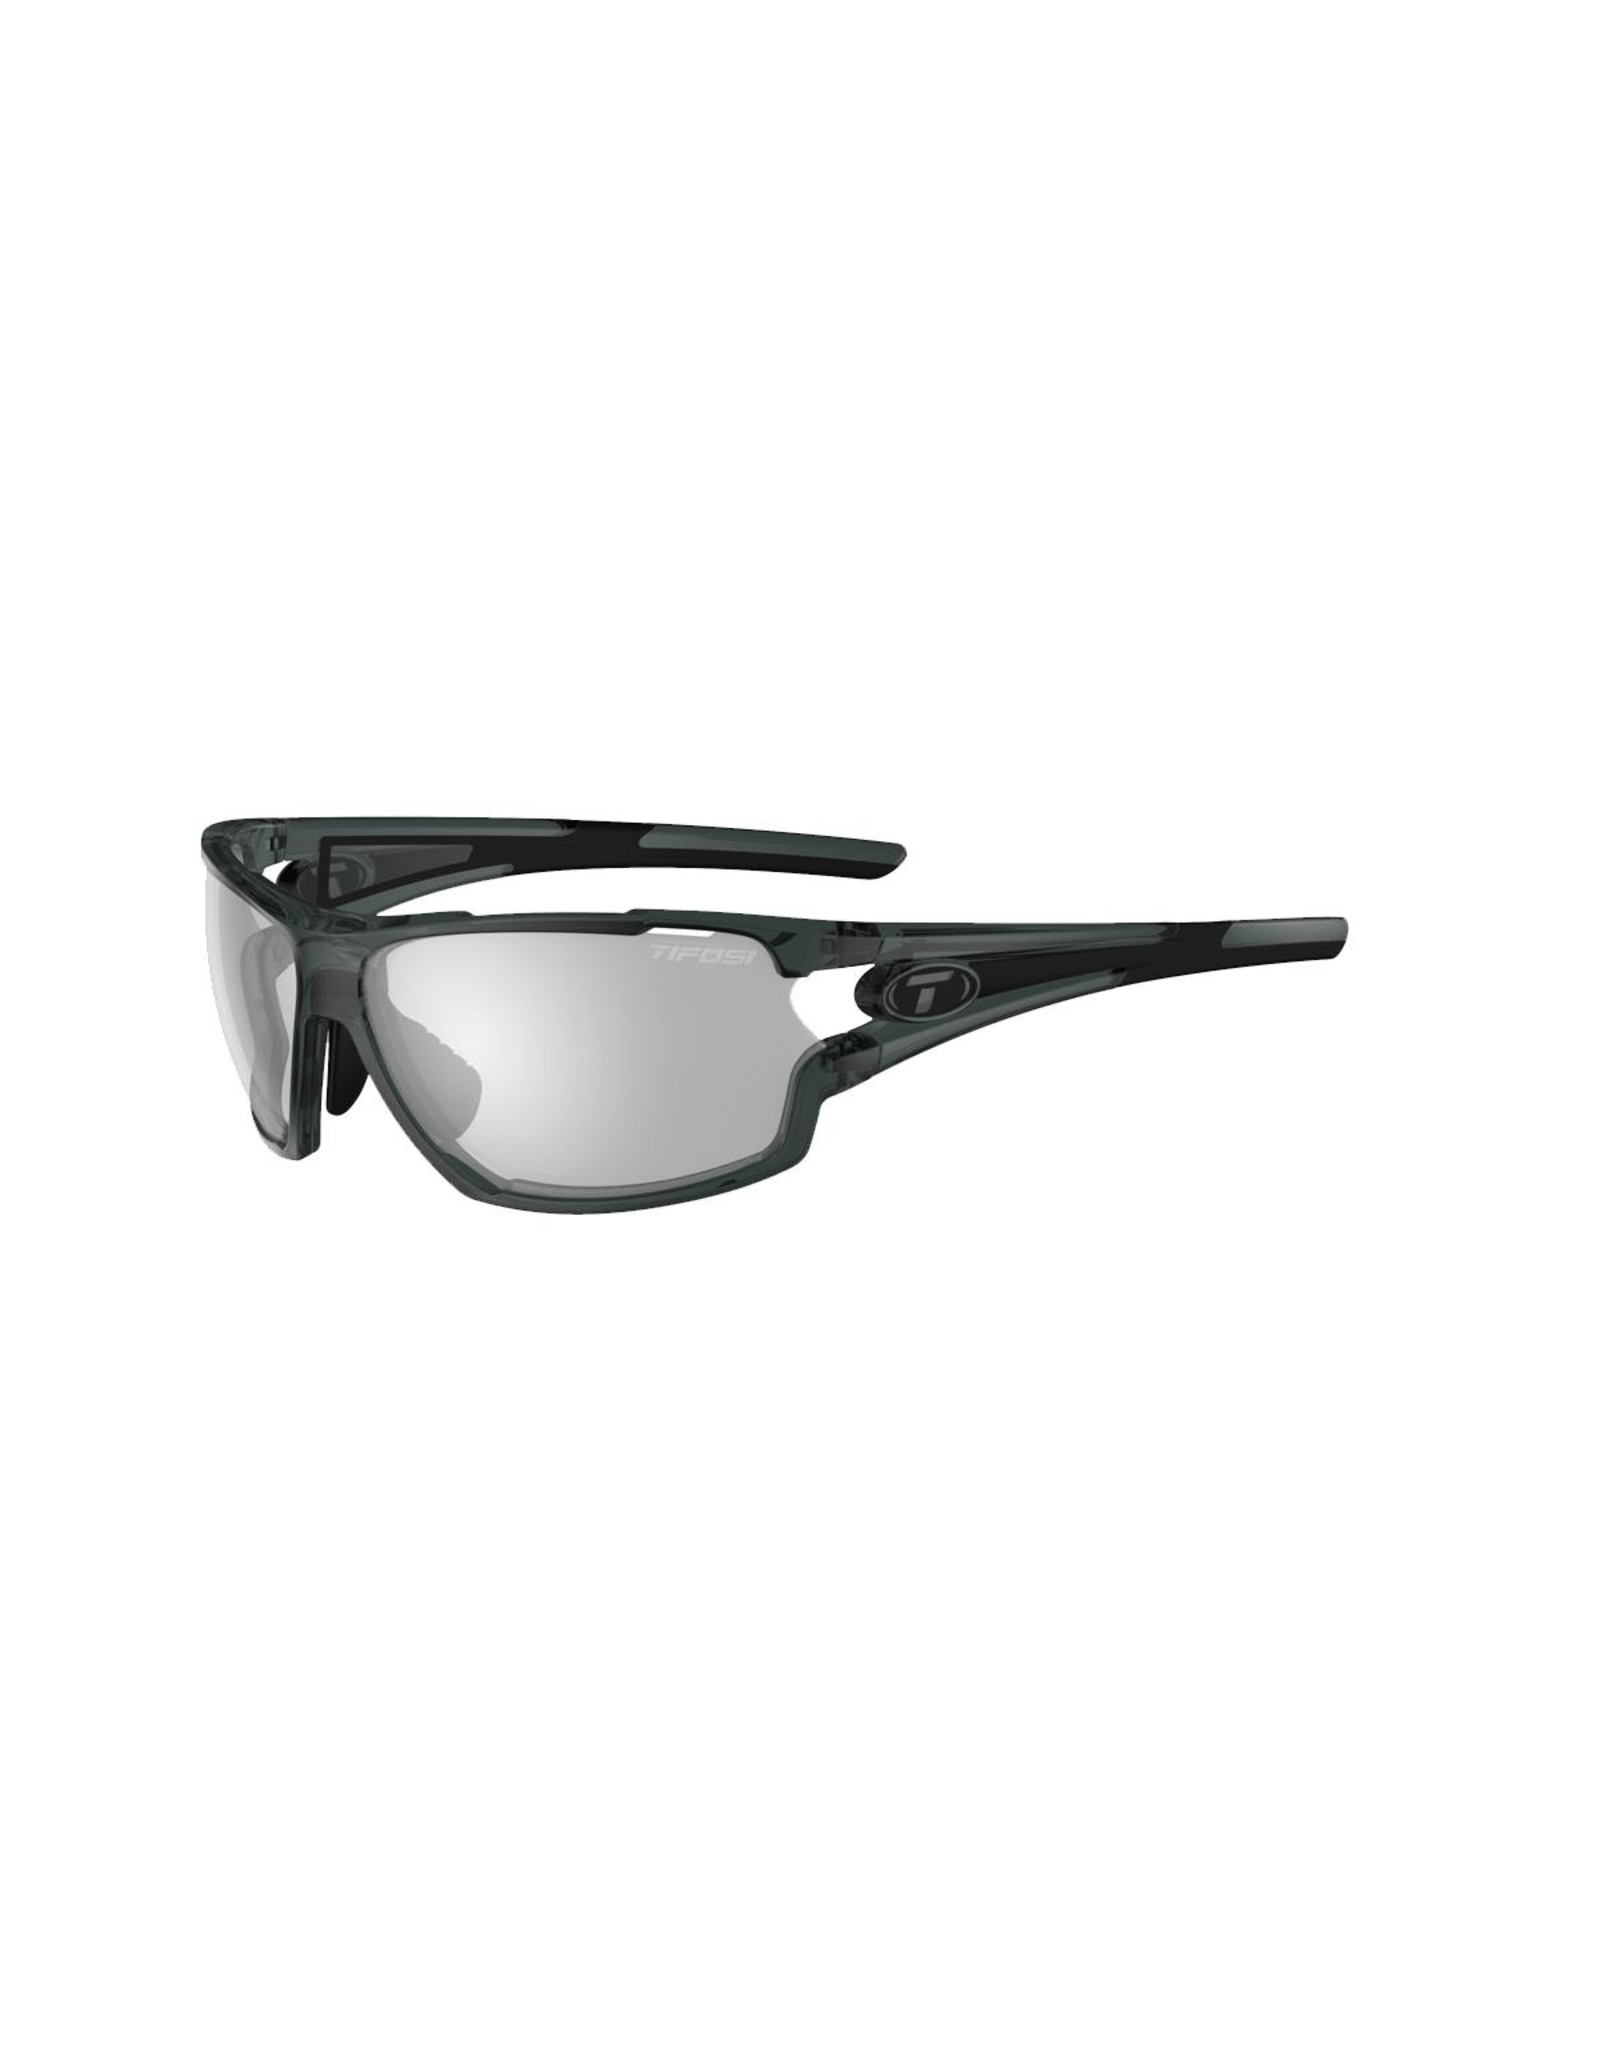 Tifosi Tifosi Amok Single Lens Eyewear 2019: Crystal Smoke/Fototec Light Night